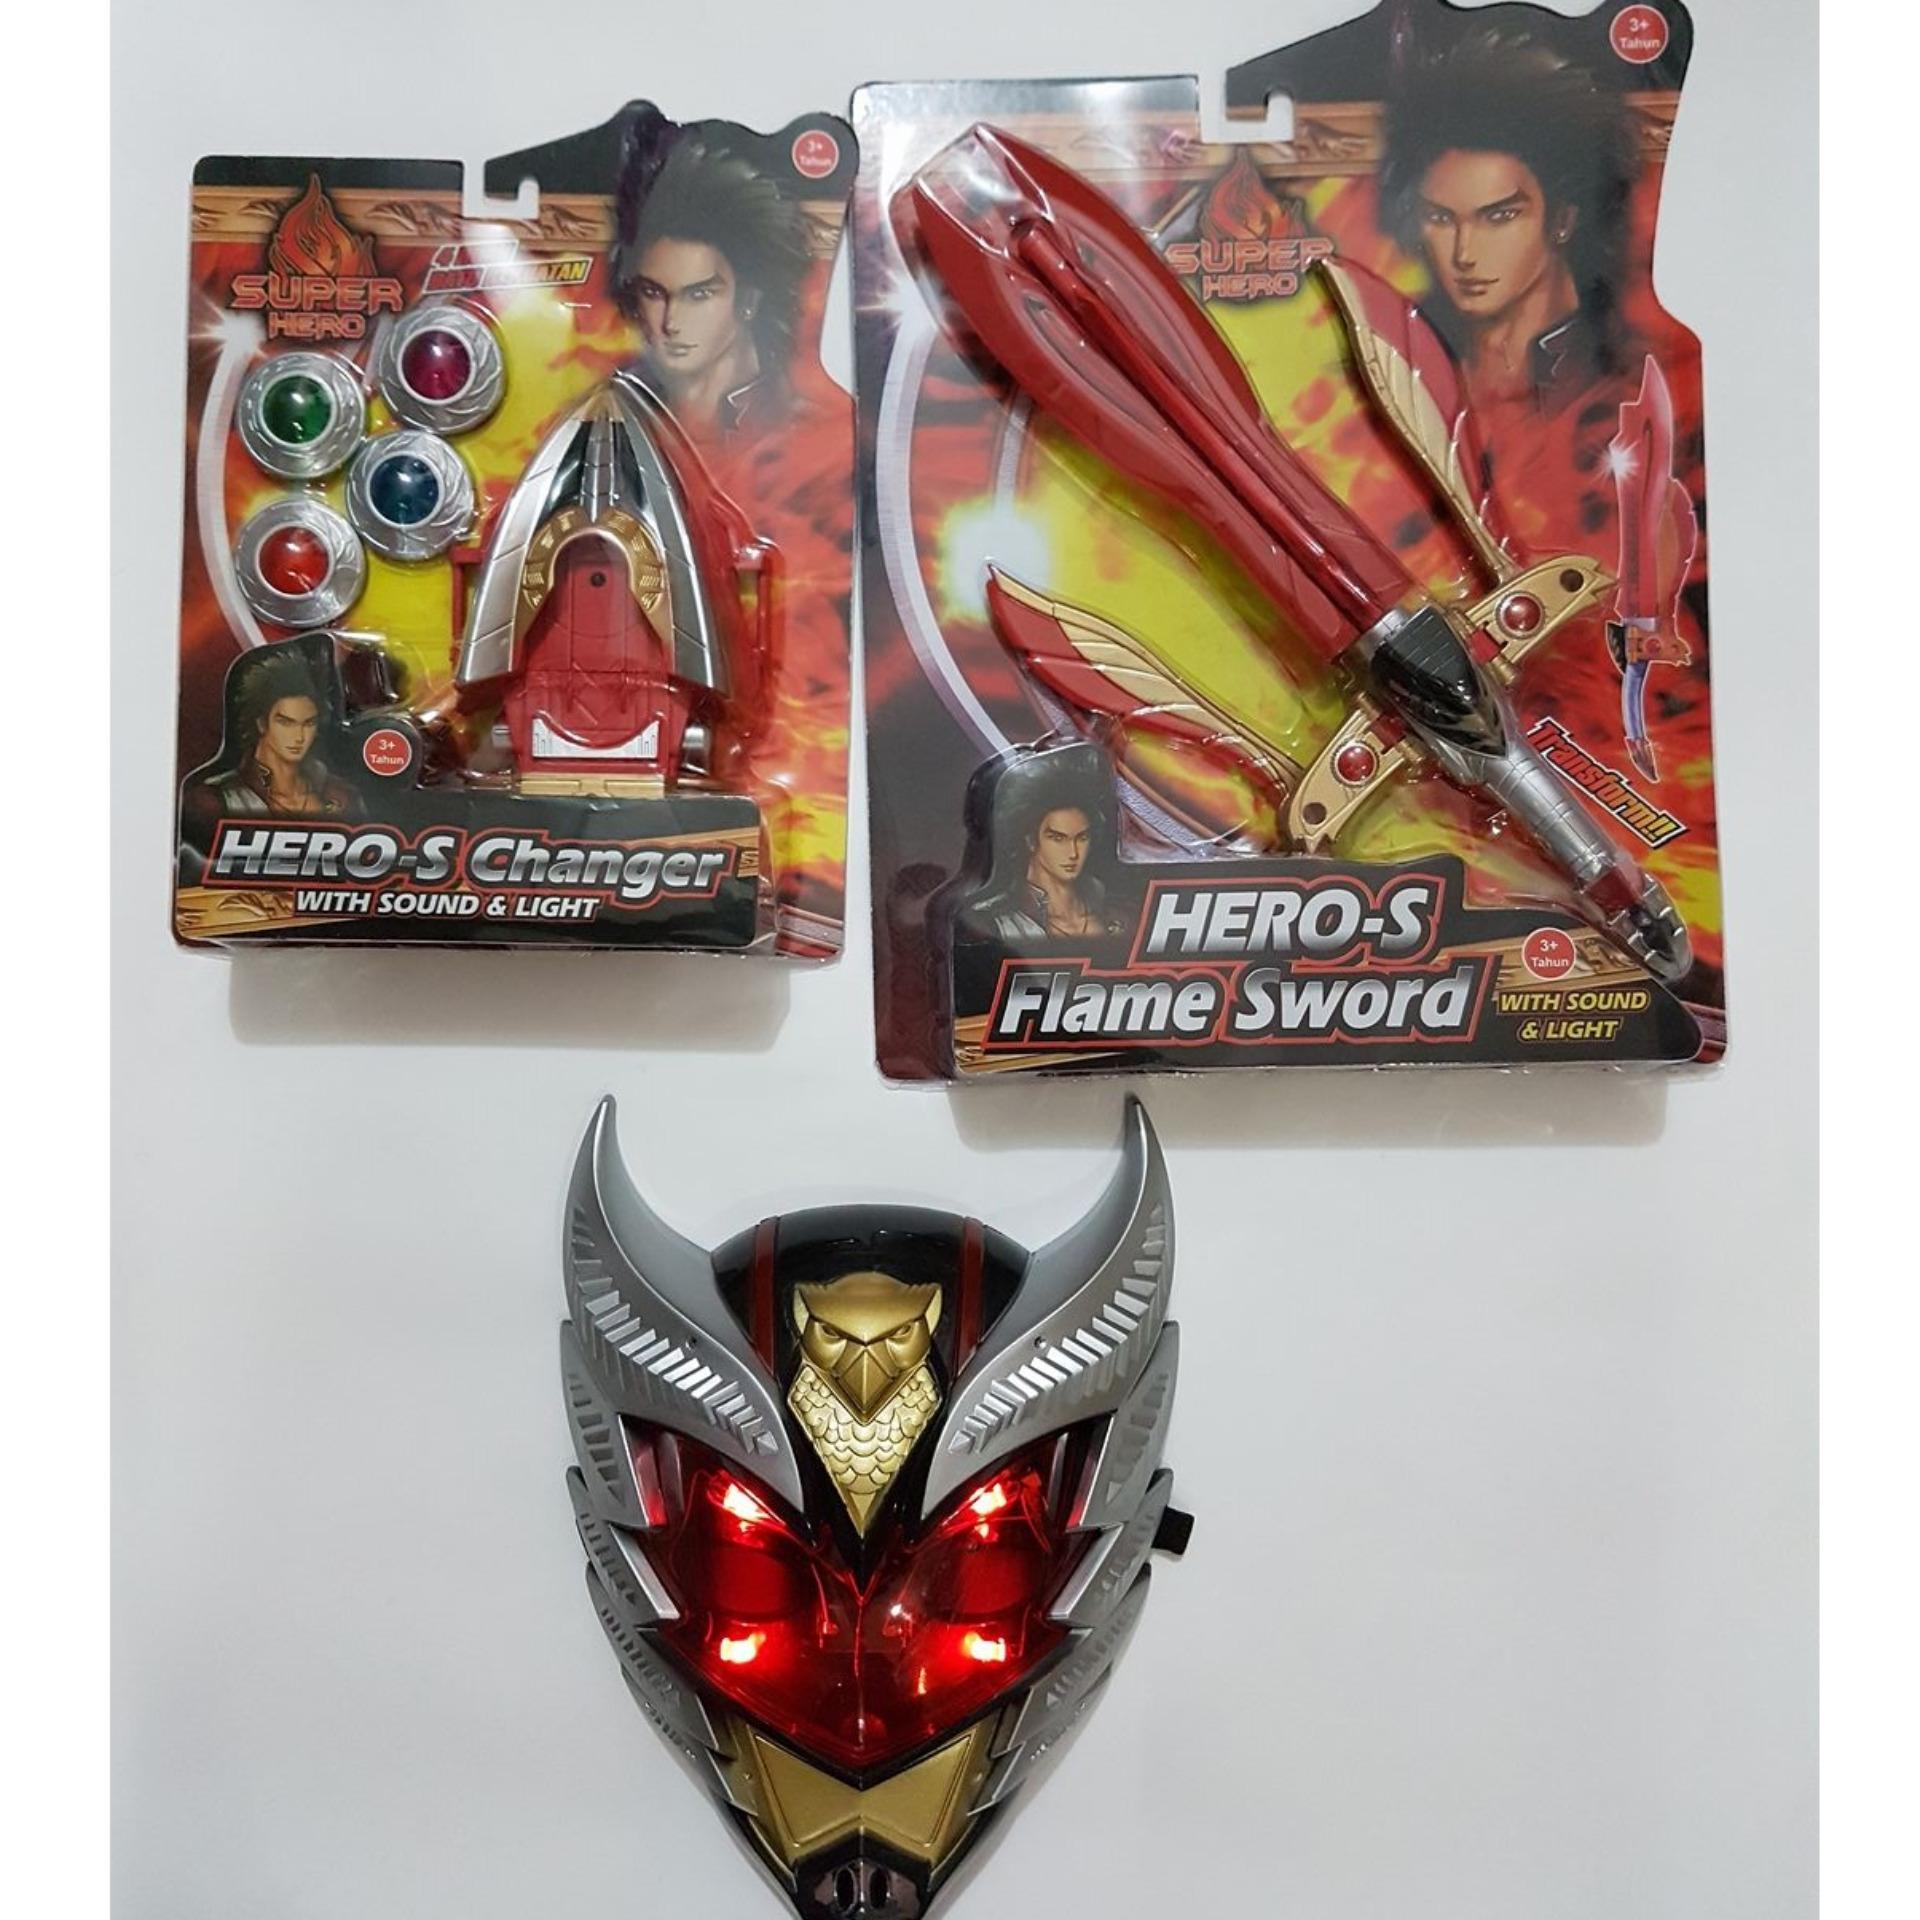 Paket Topeng Bima-X Lampu Lengkap Pedang Merah Dan Jam X-Changer